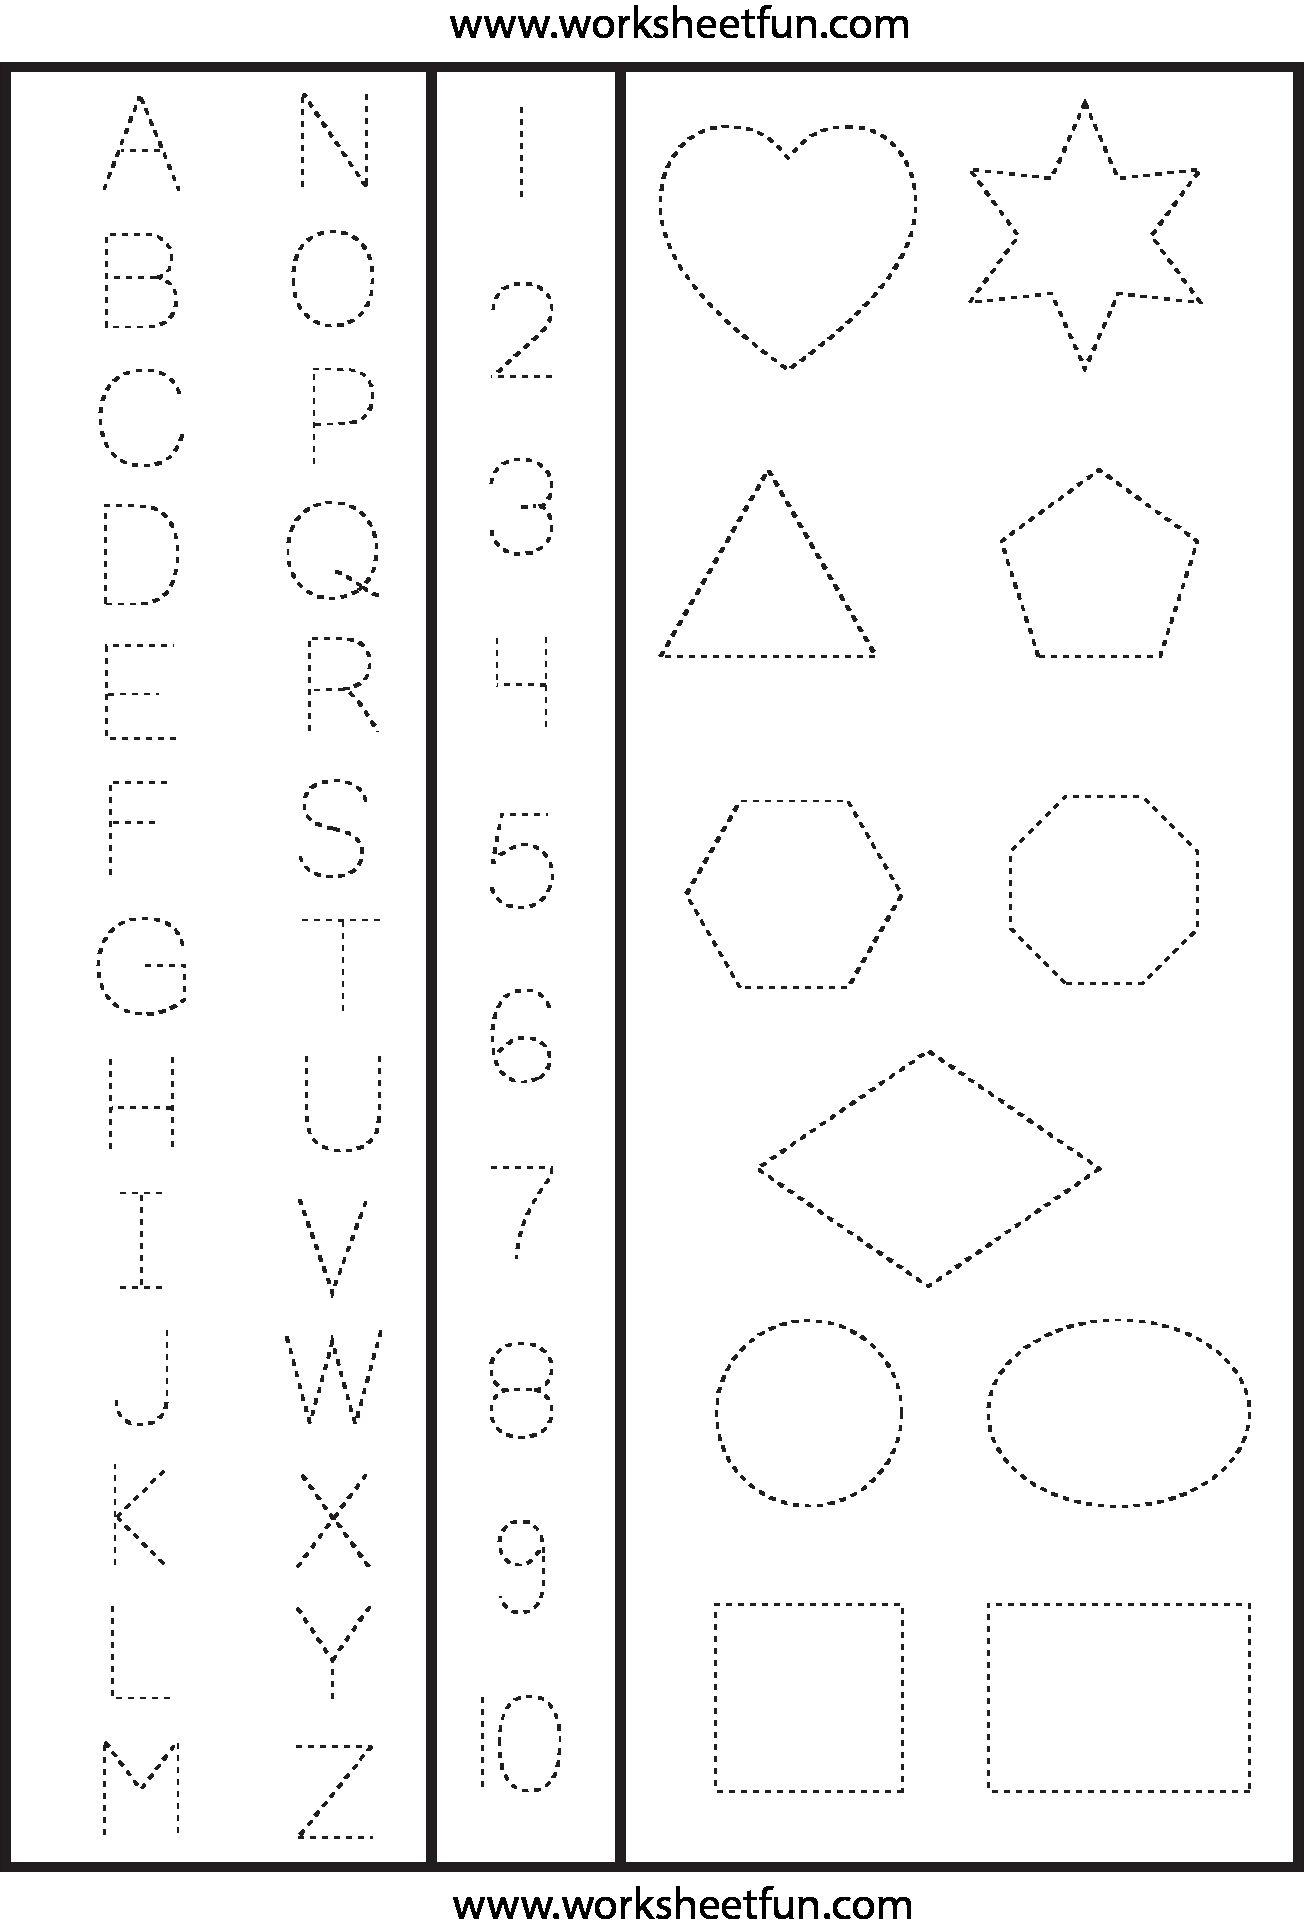 123 Tracing Worksheets Preschool In 2020 | Shape Tracing